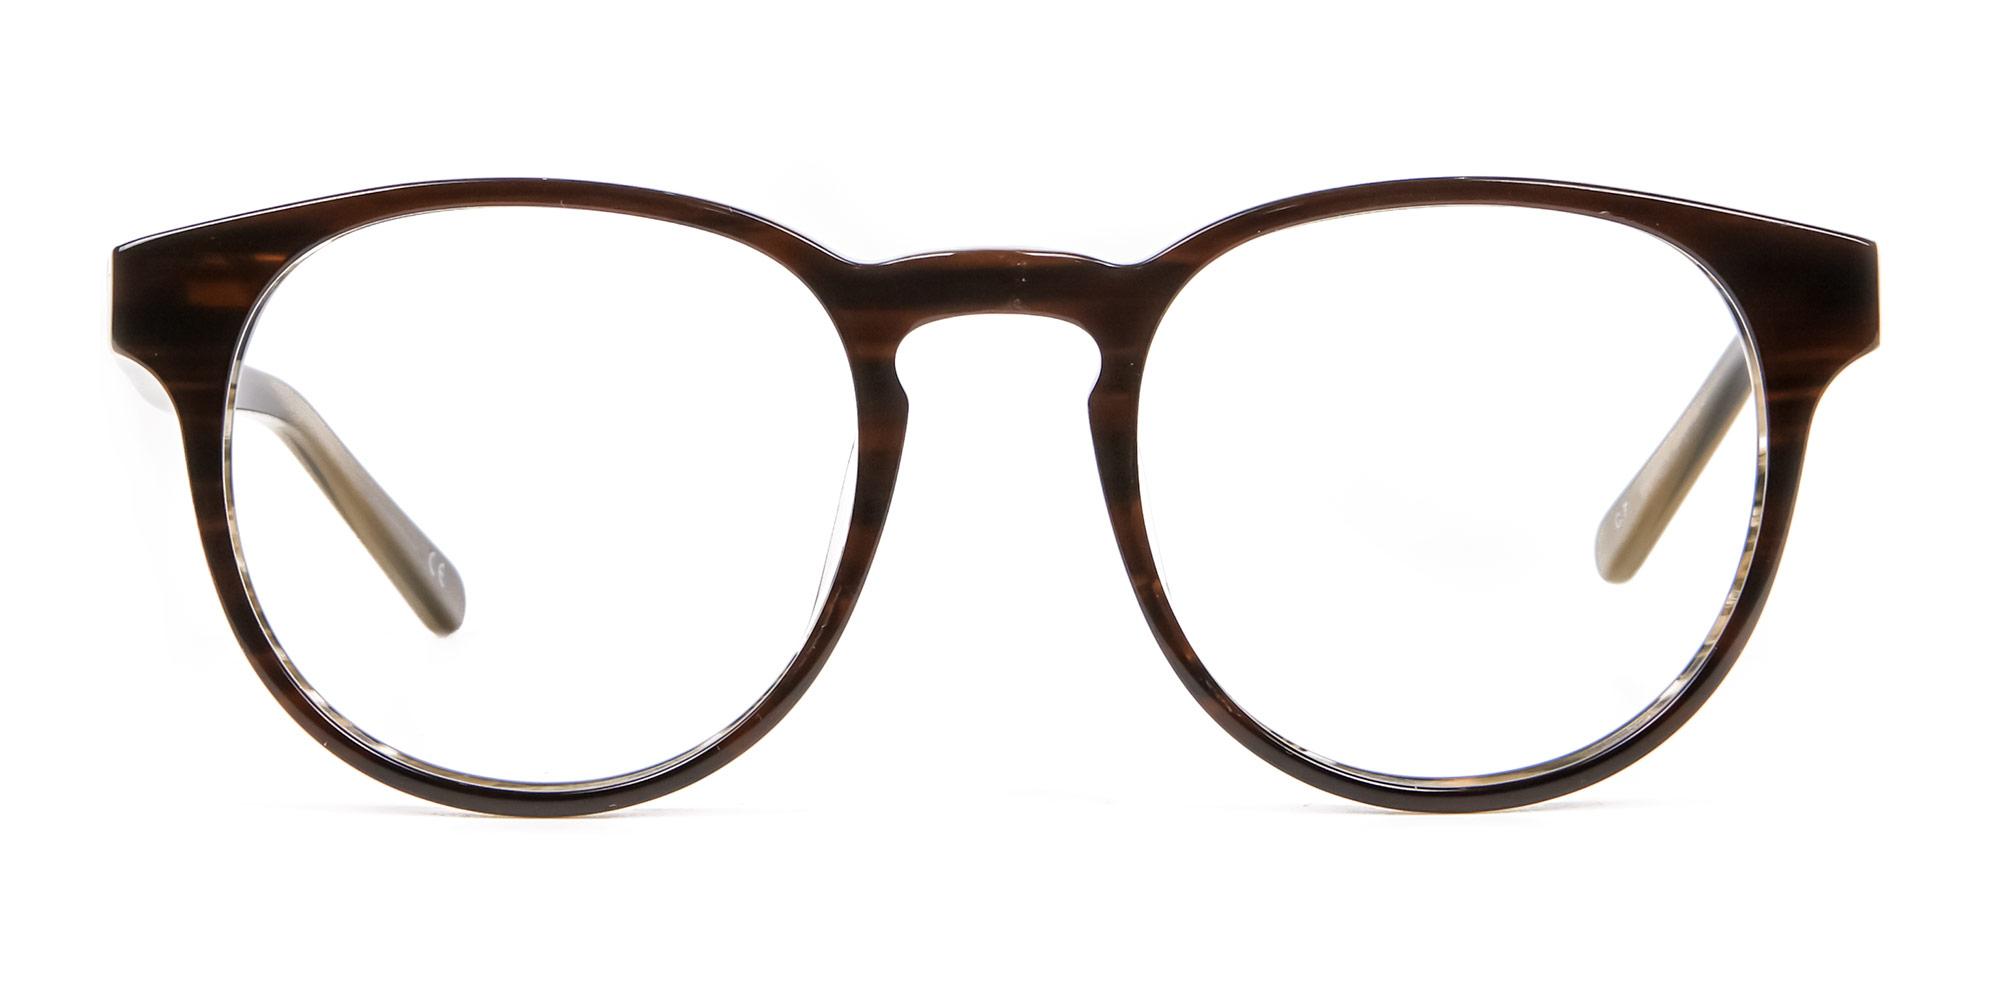 Dark Wooden Mahogany Brown Eyeglasses in Round